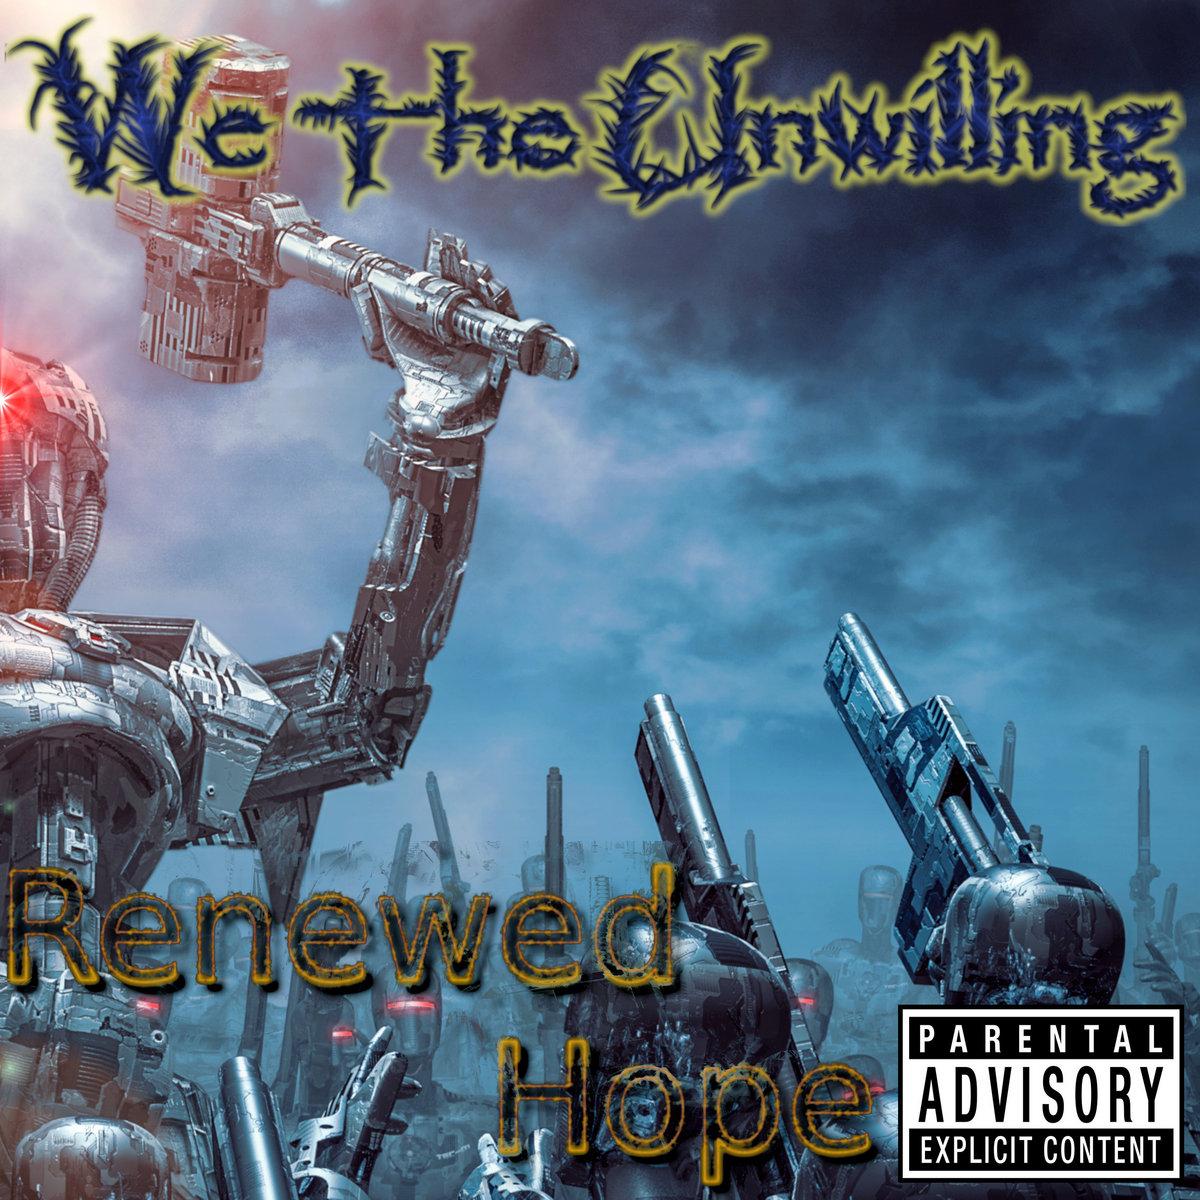 www.facebook.com/wetheunwilling